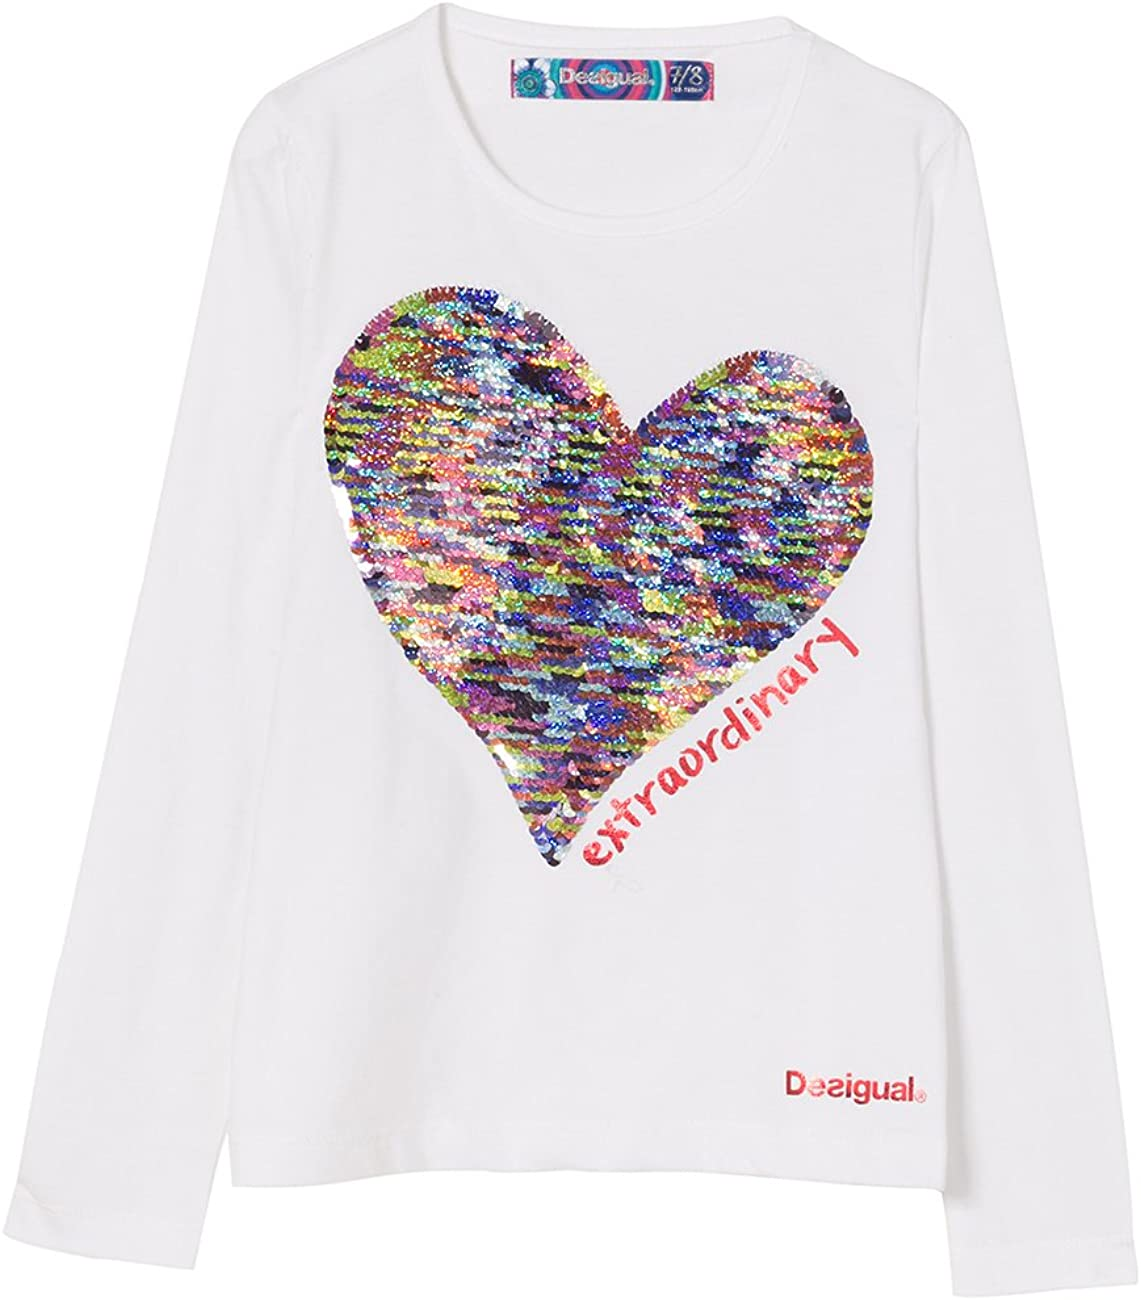 Desigual TS/_Vancouver Camisa Manga Larga para Ni/ñas